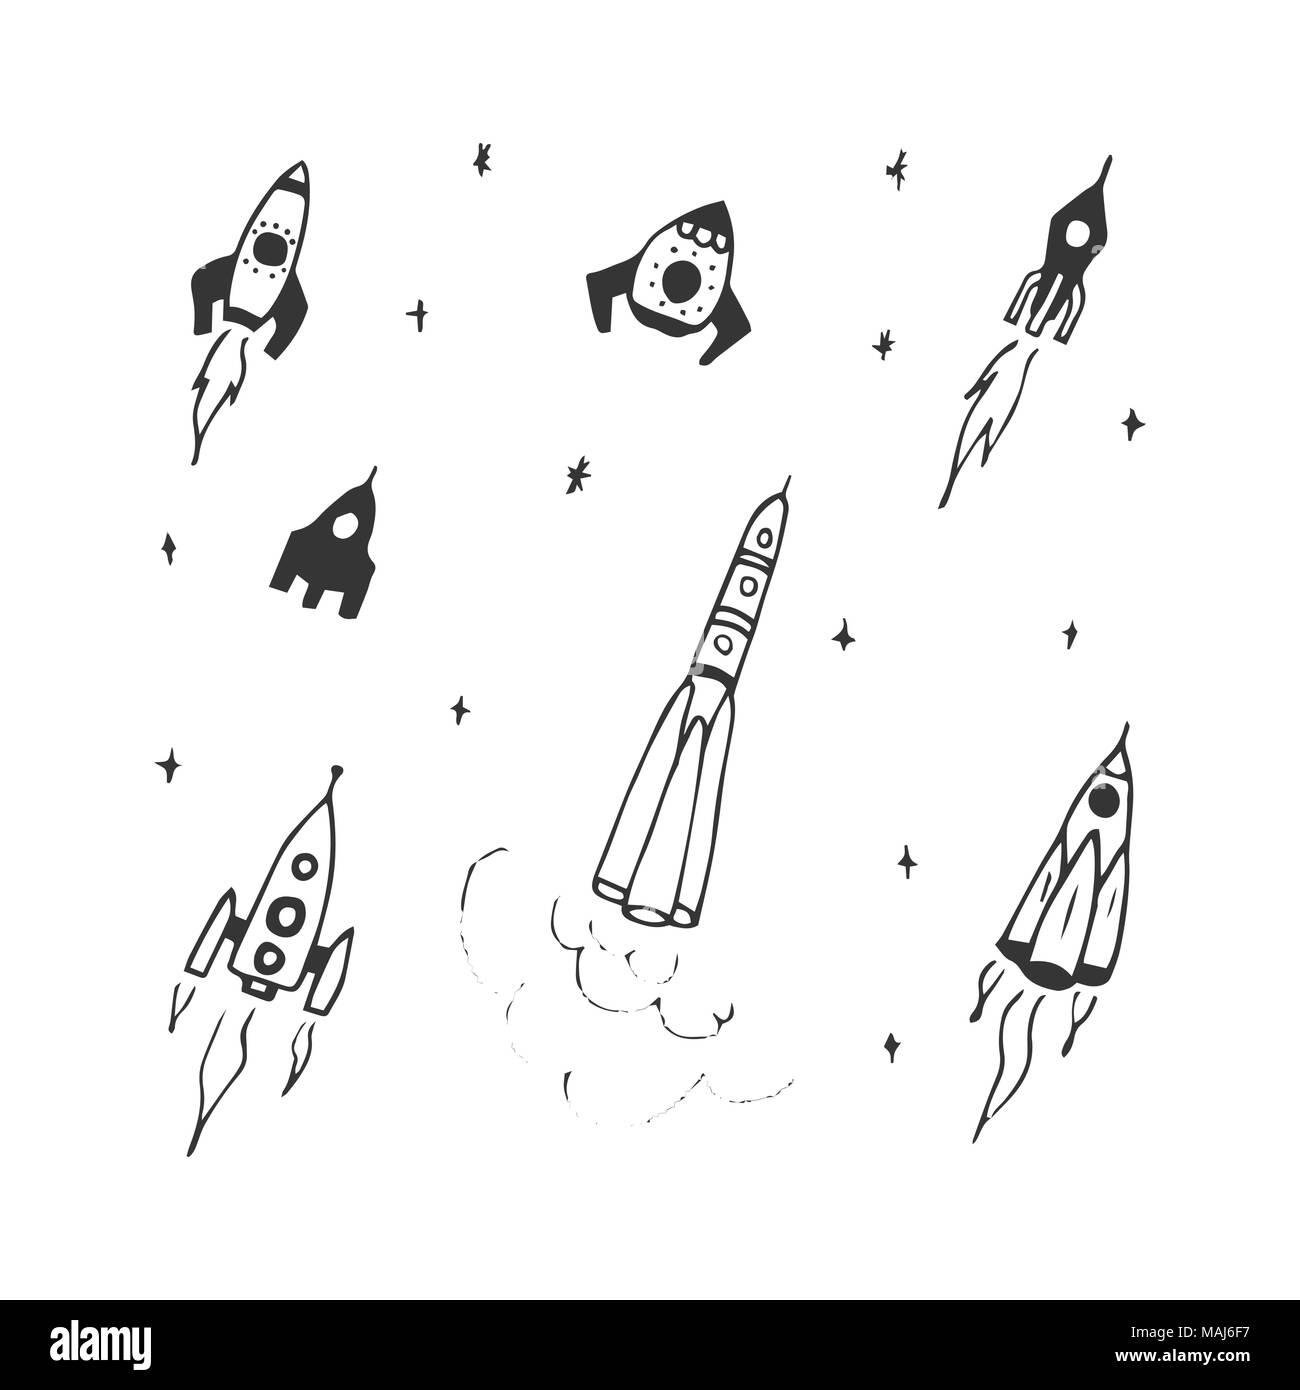 Vector set of hand drawn doodle rocket icon and rocket silhouette. Icon design rocket, spaceships, rocket ship - Stock Vector